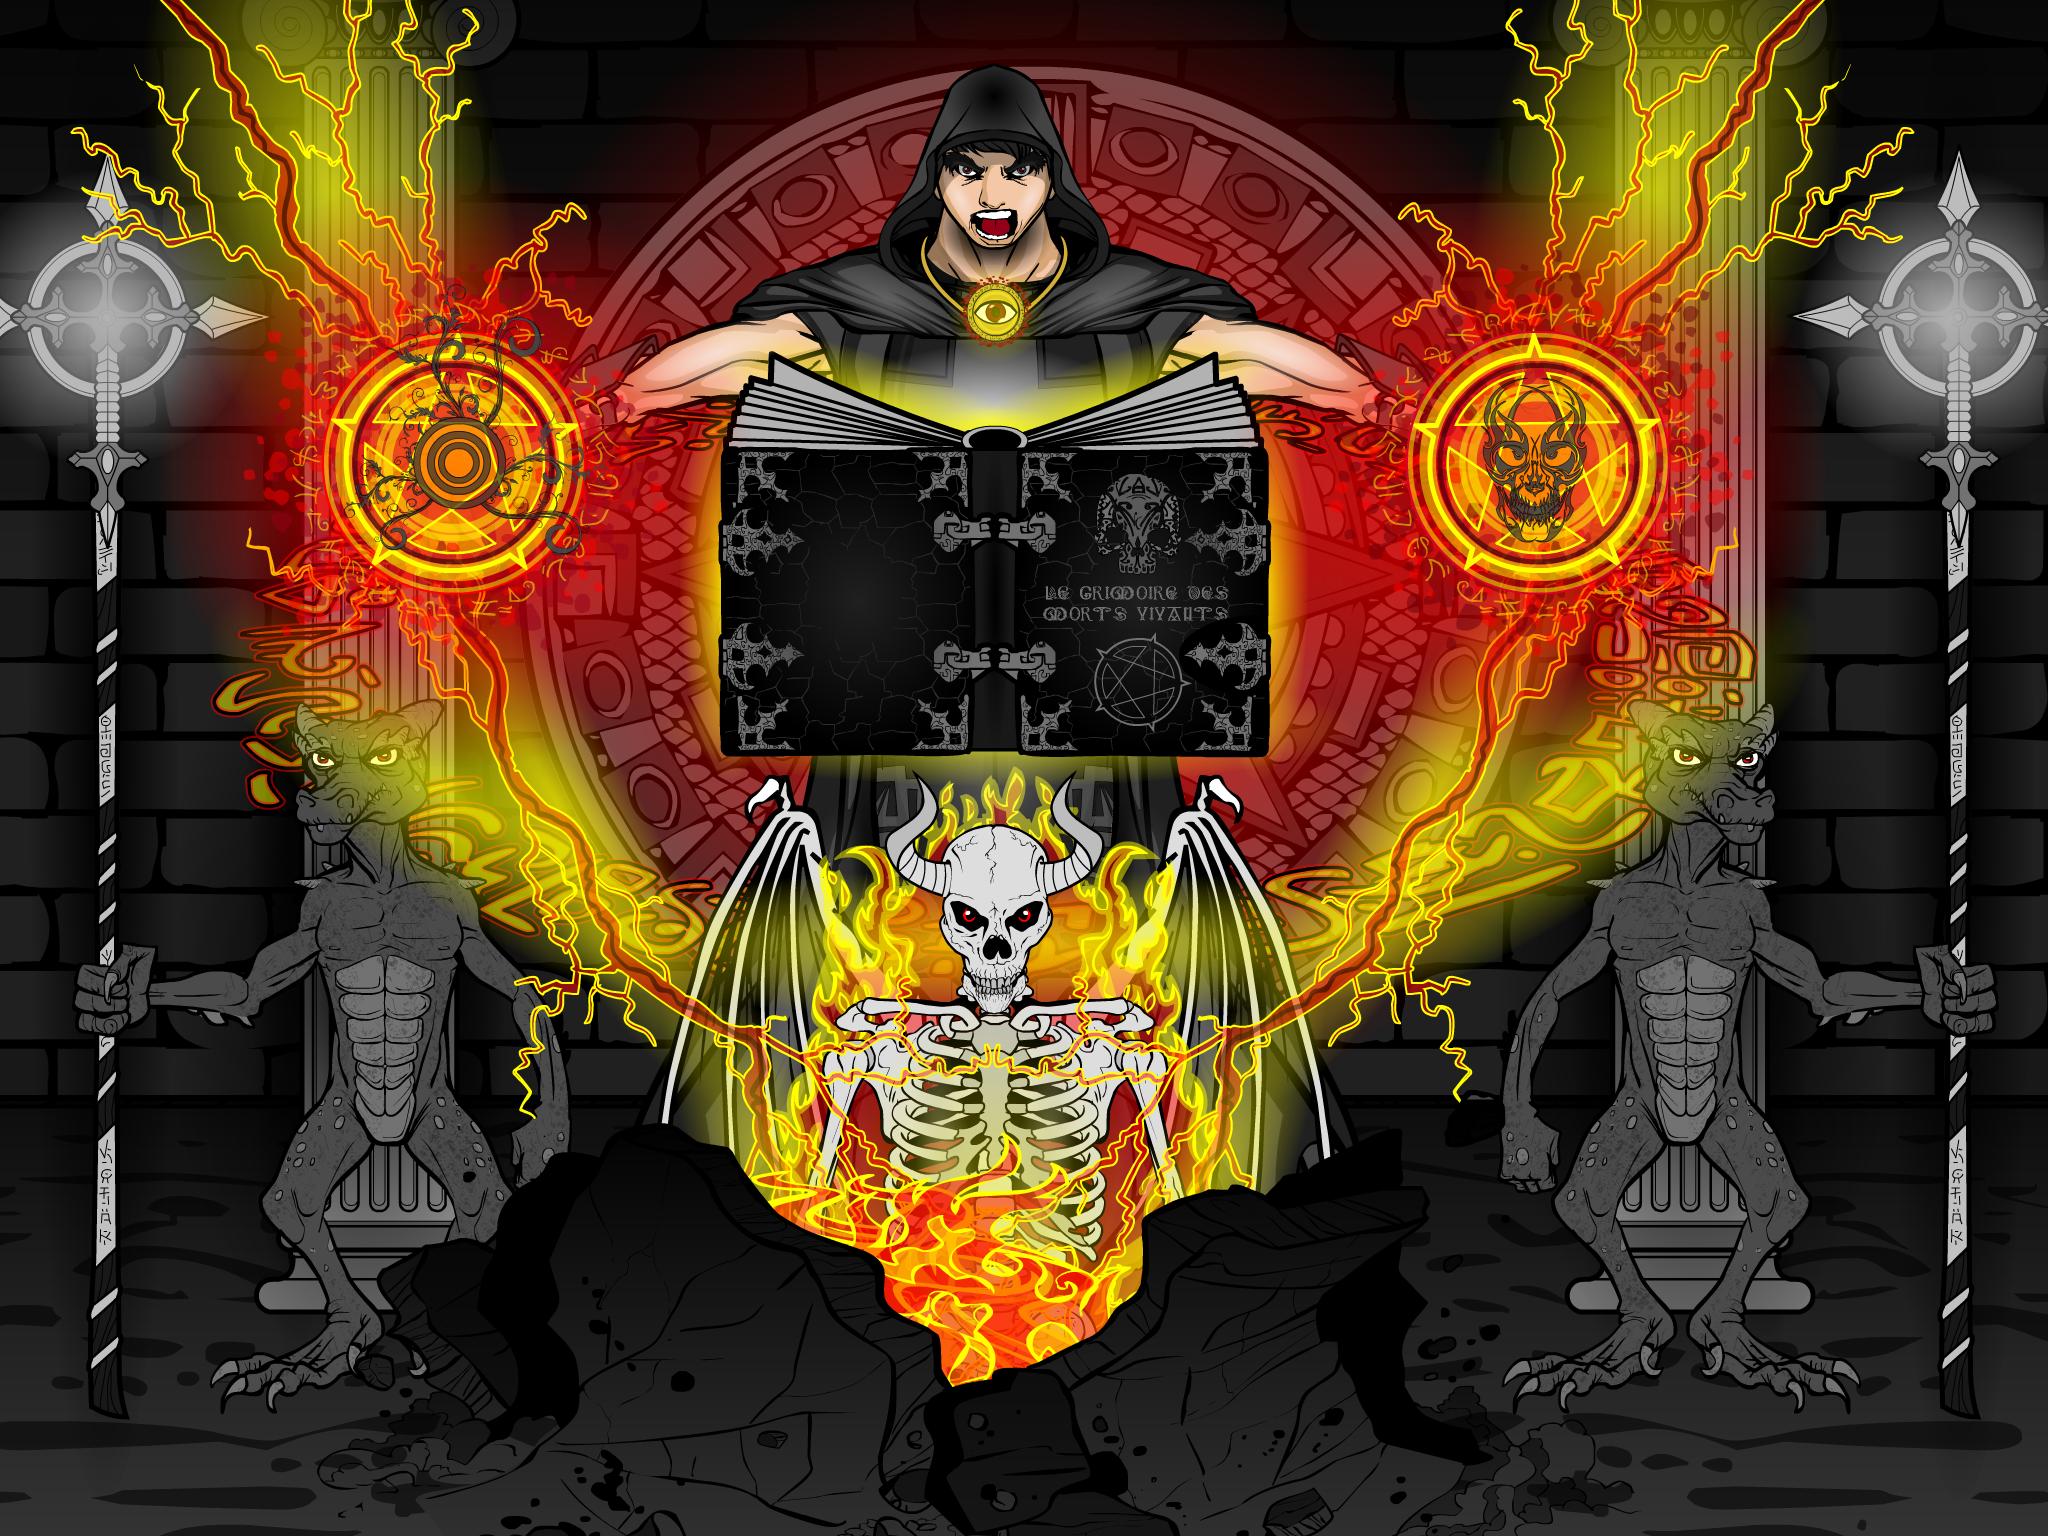 Dark Mage - The Summoning